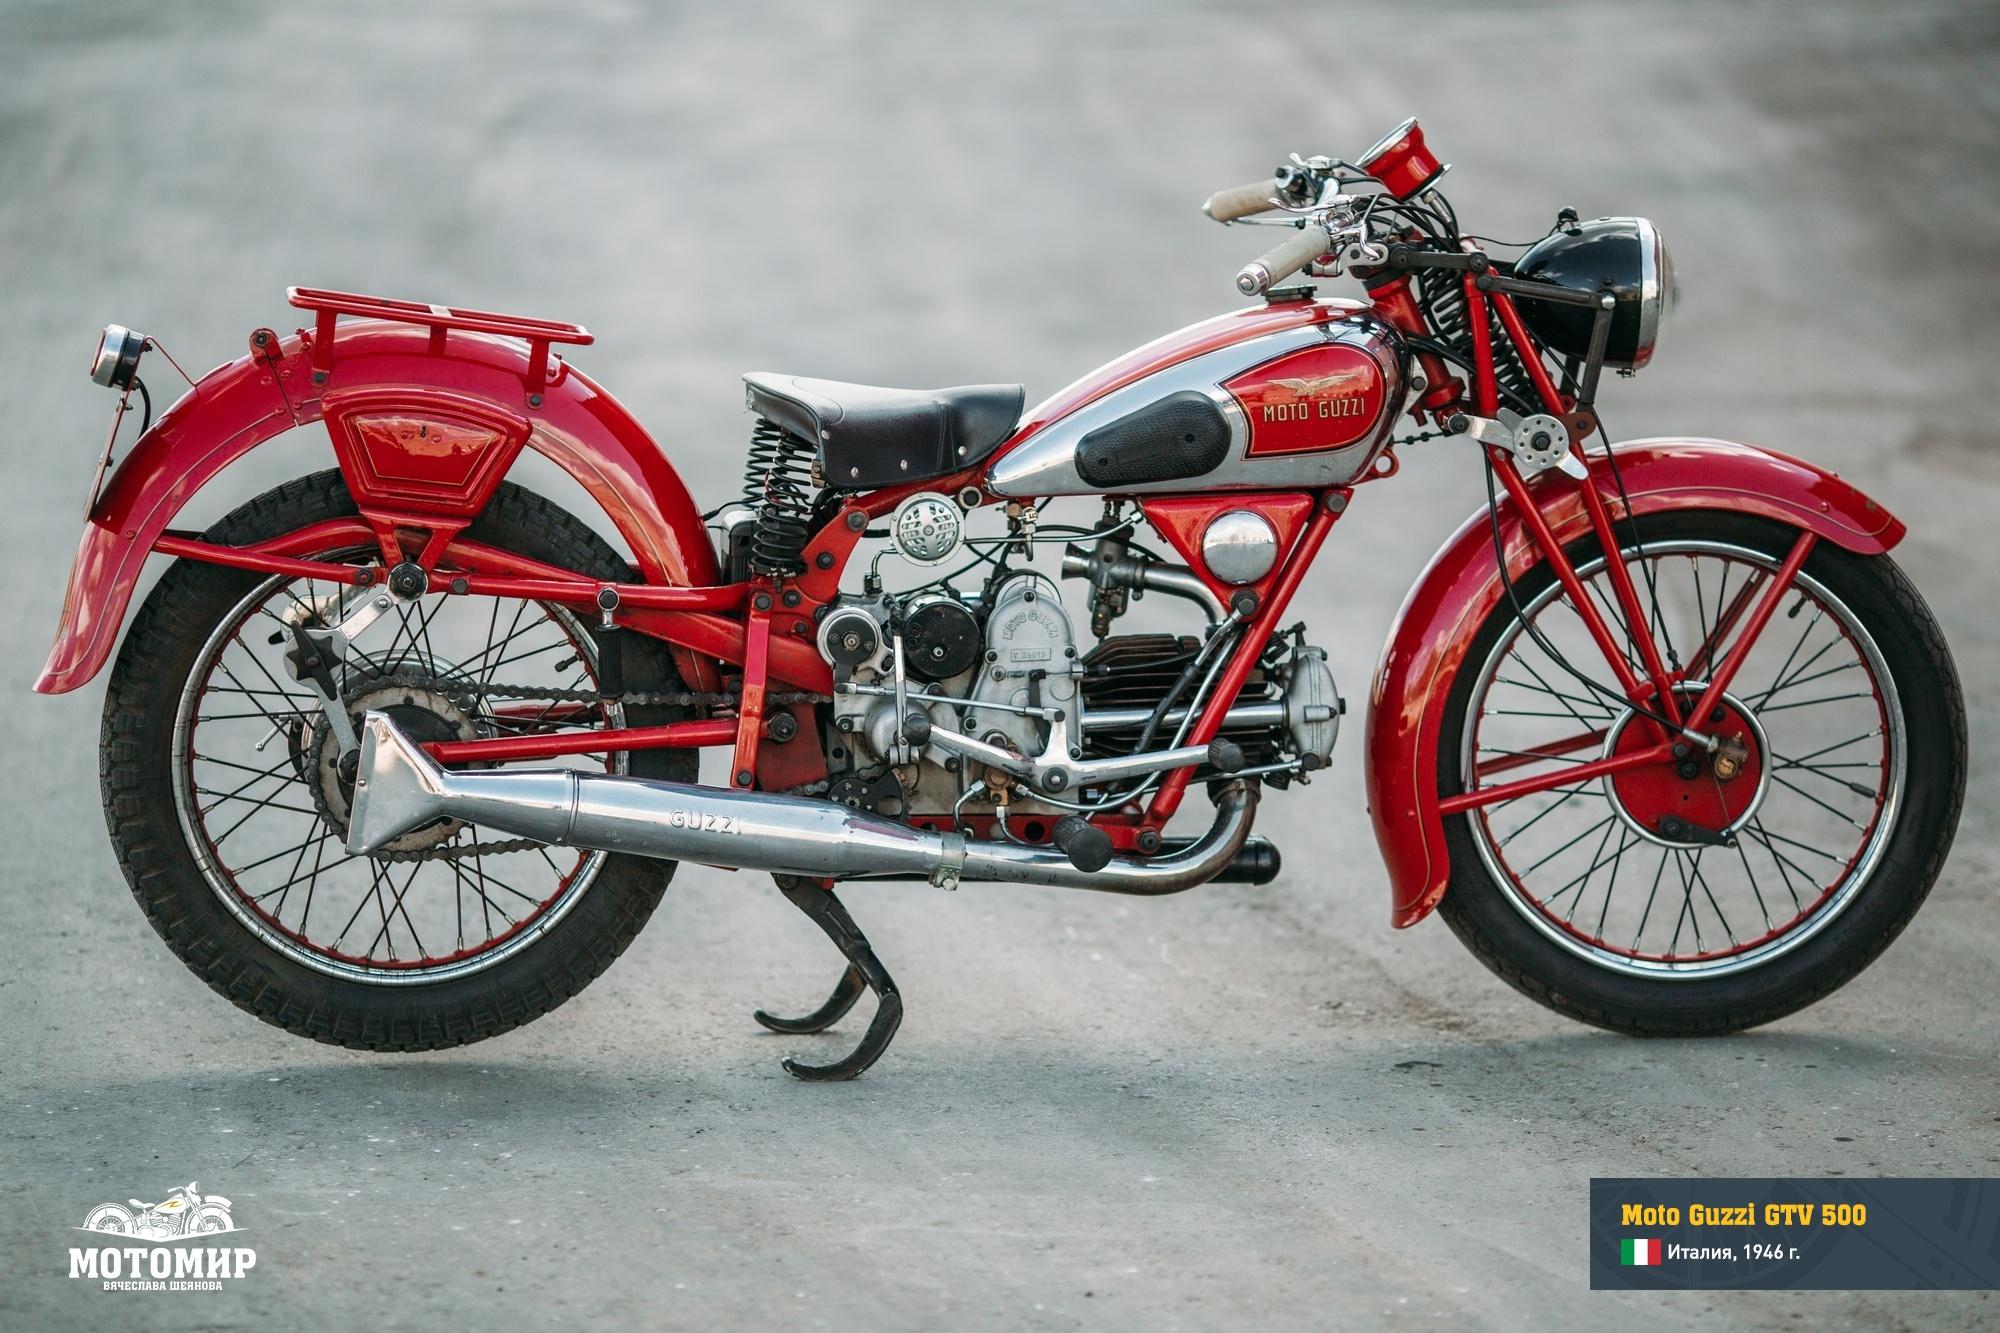 moto-guzzi-gtv-500-201509-web-01